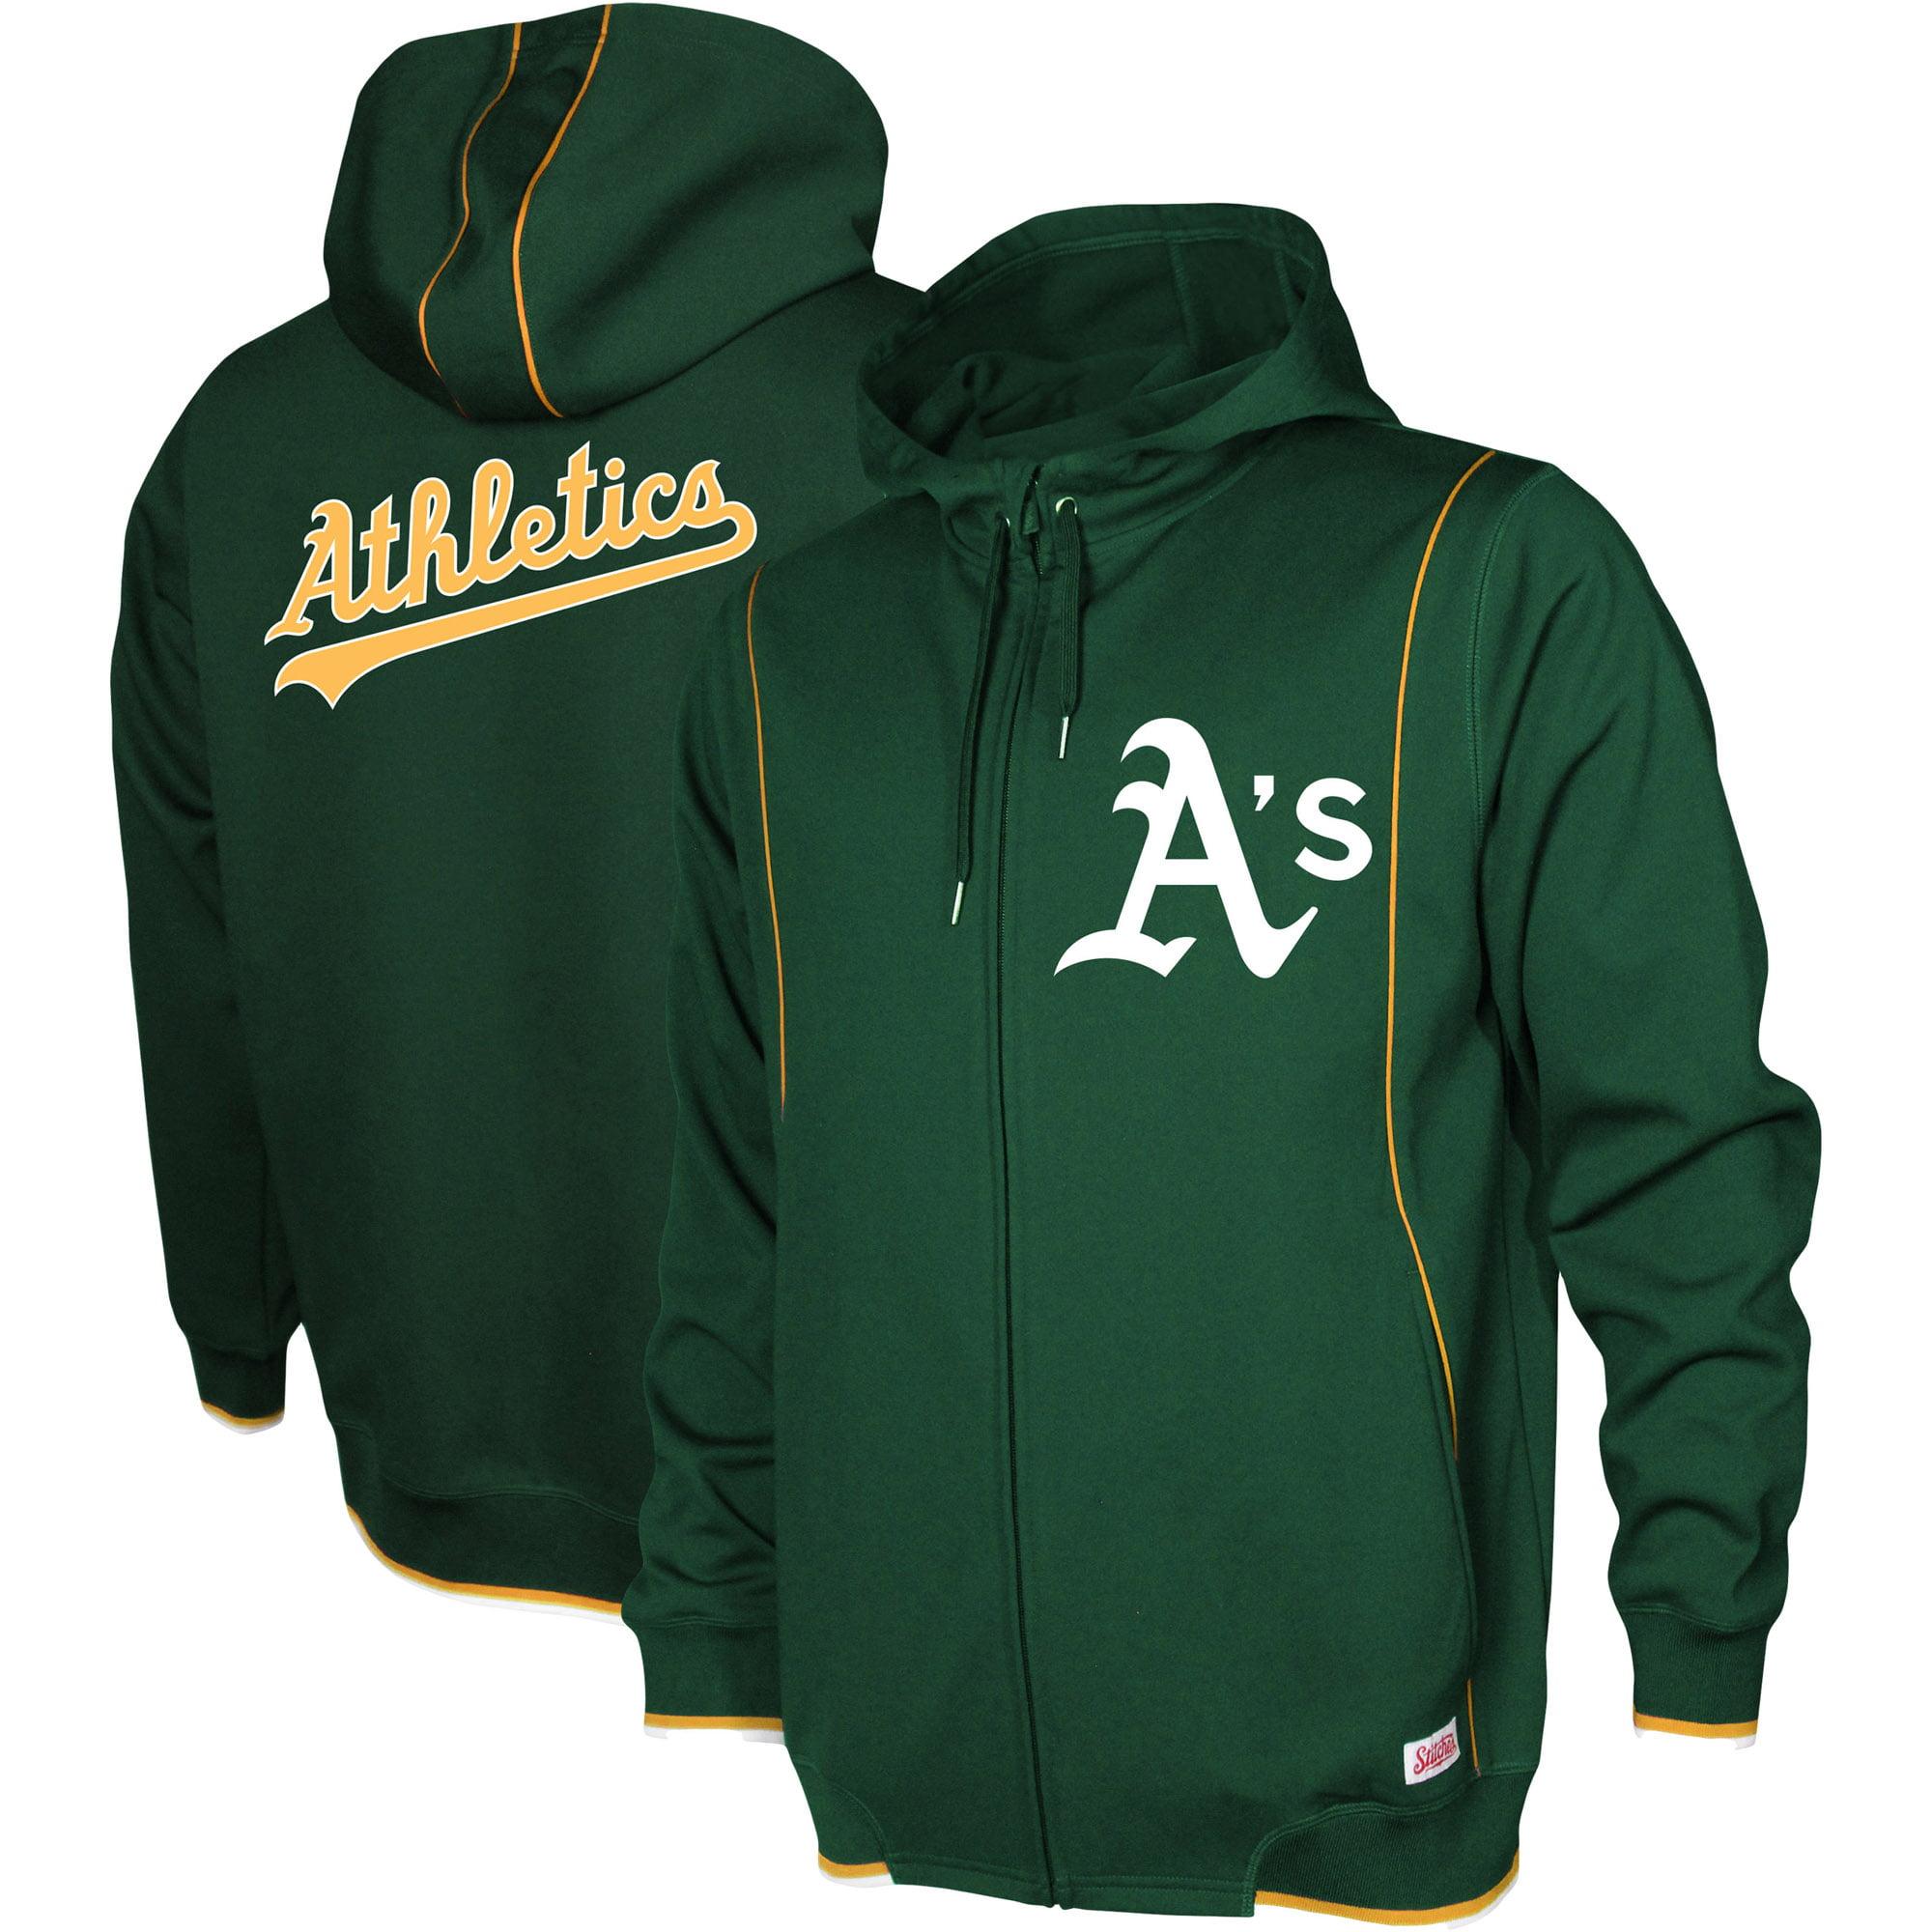 Oakland Athletics Stitches Logo Full-Zip Hoodie - Green